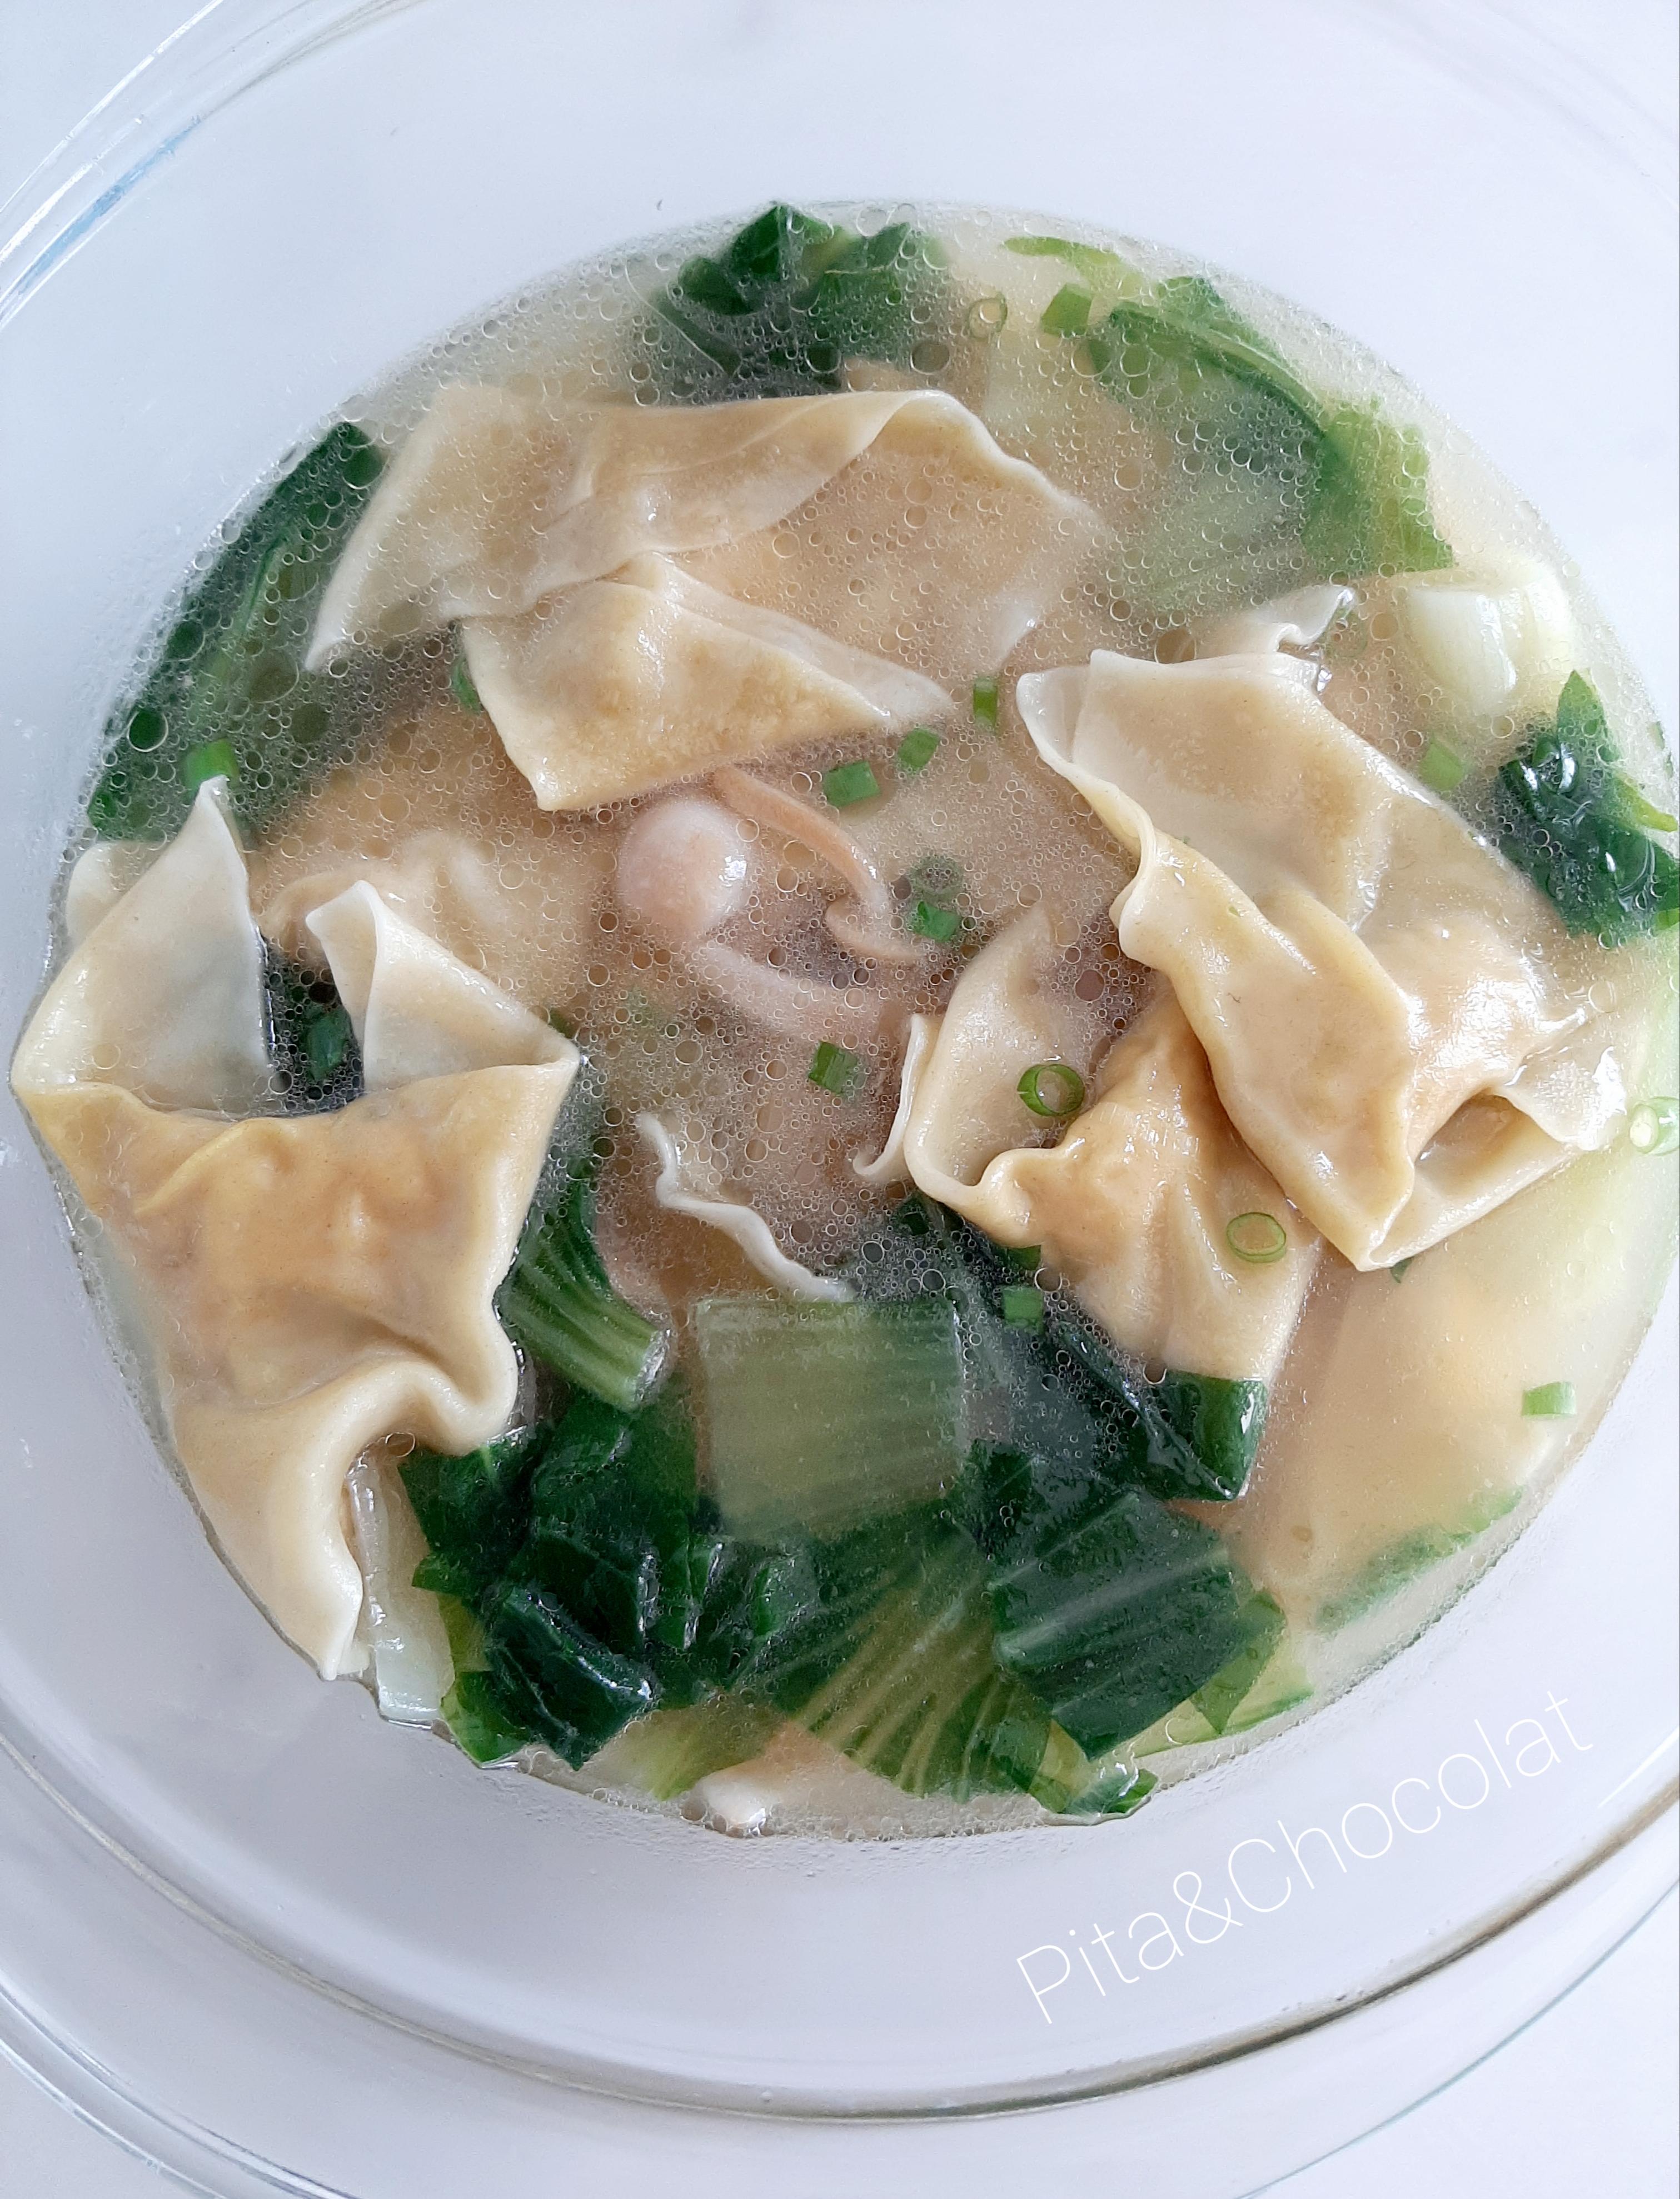 Soupe won ton - potage aux ravioli chinois